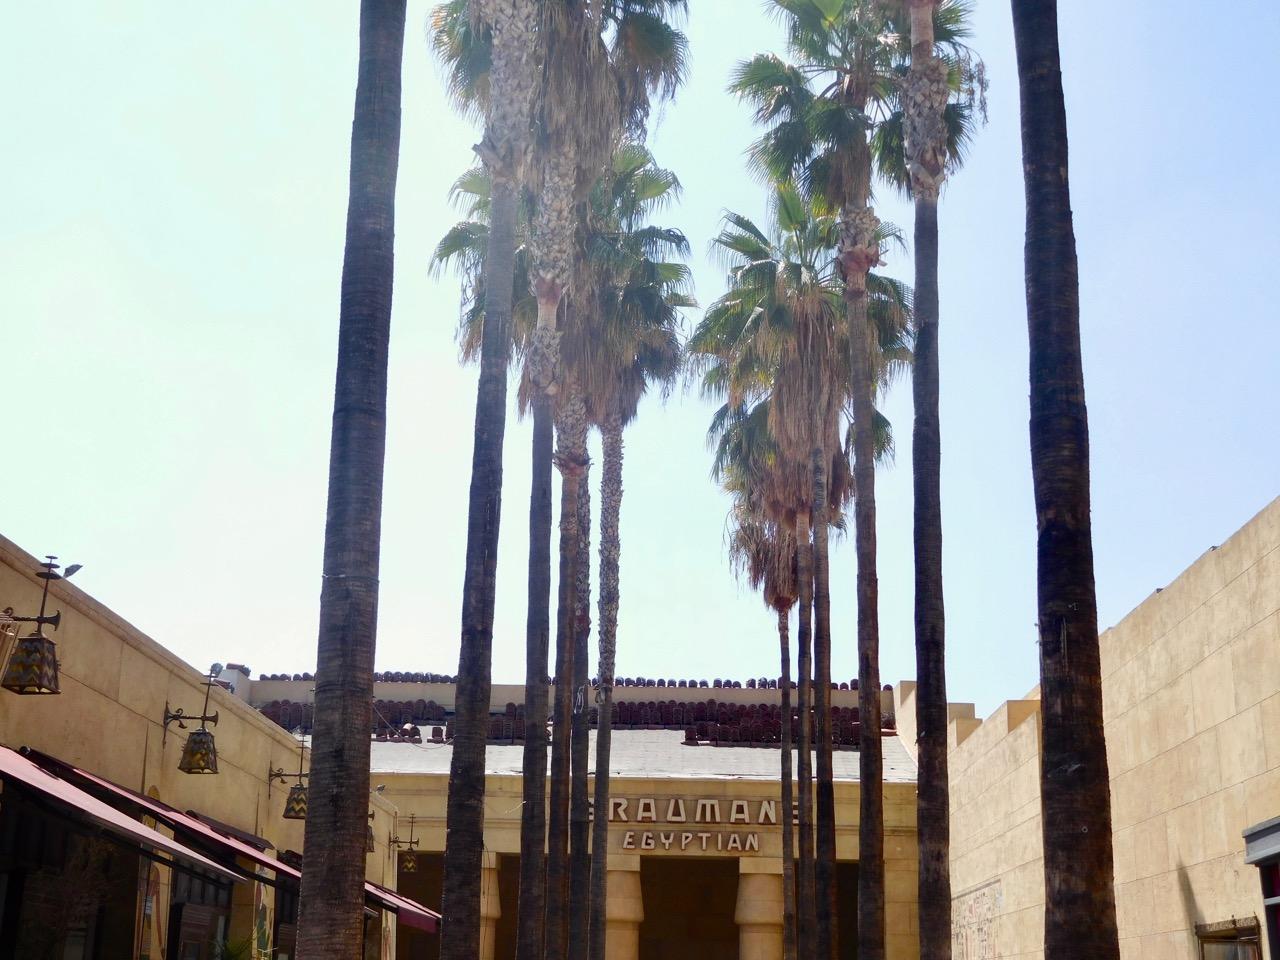 3 Days in Hollywood - Hollywood Boulevard (6)